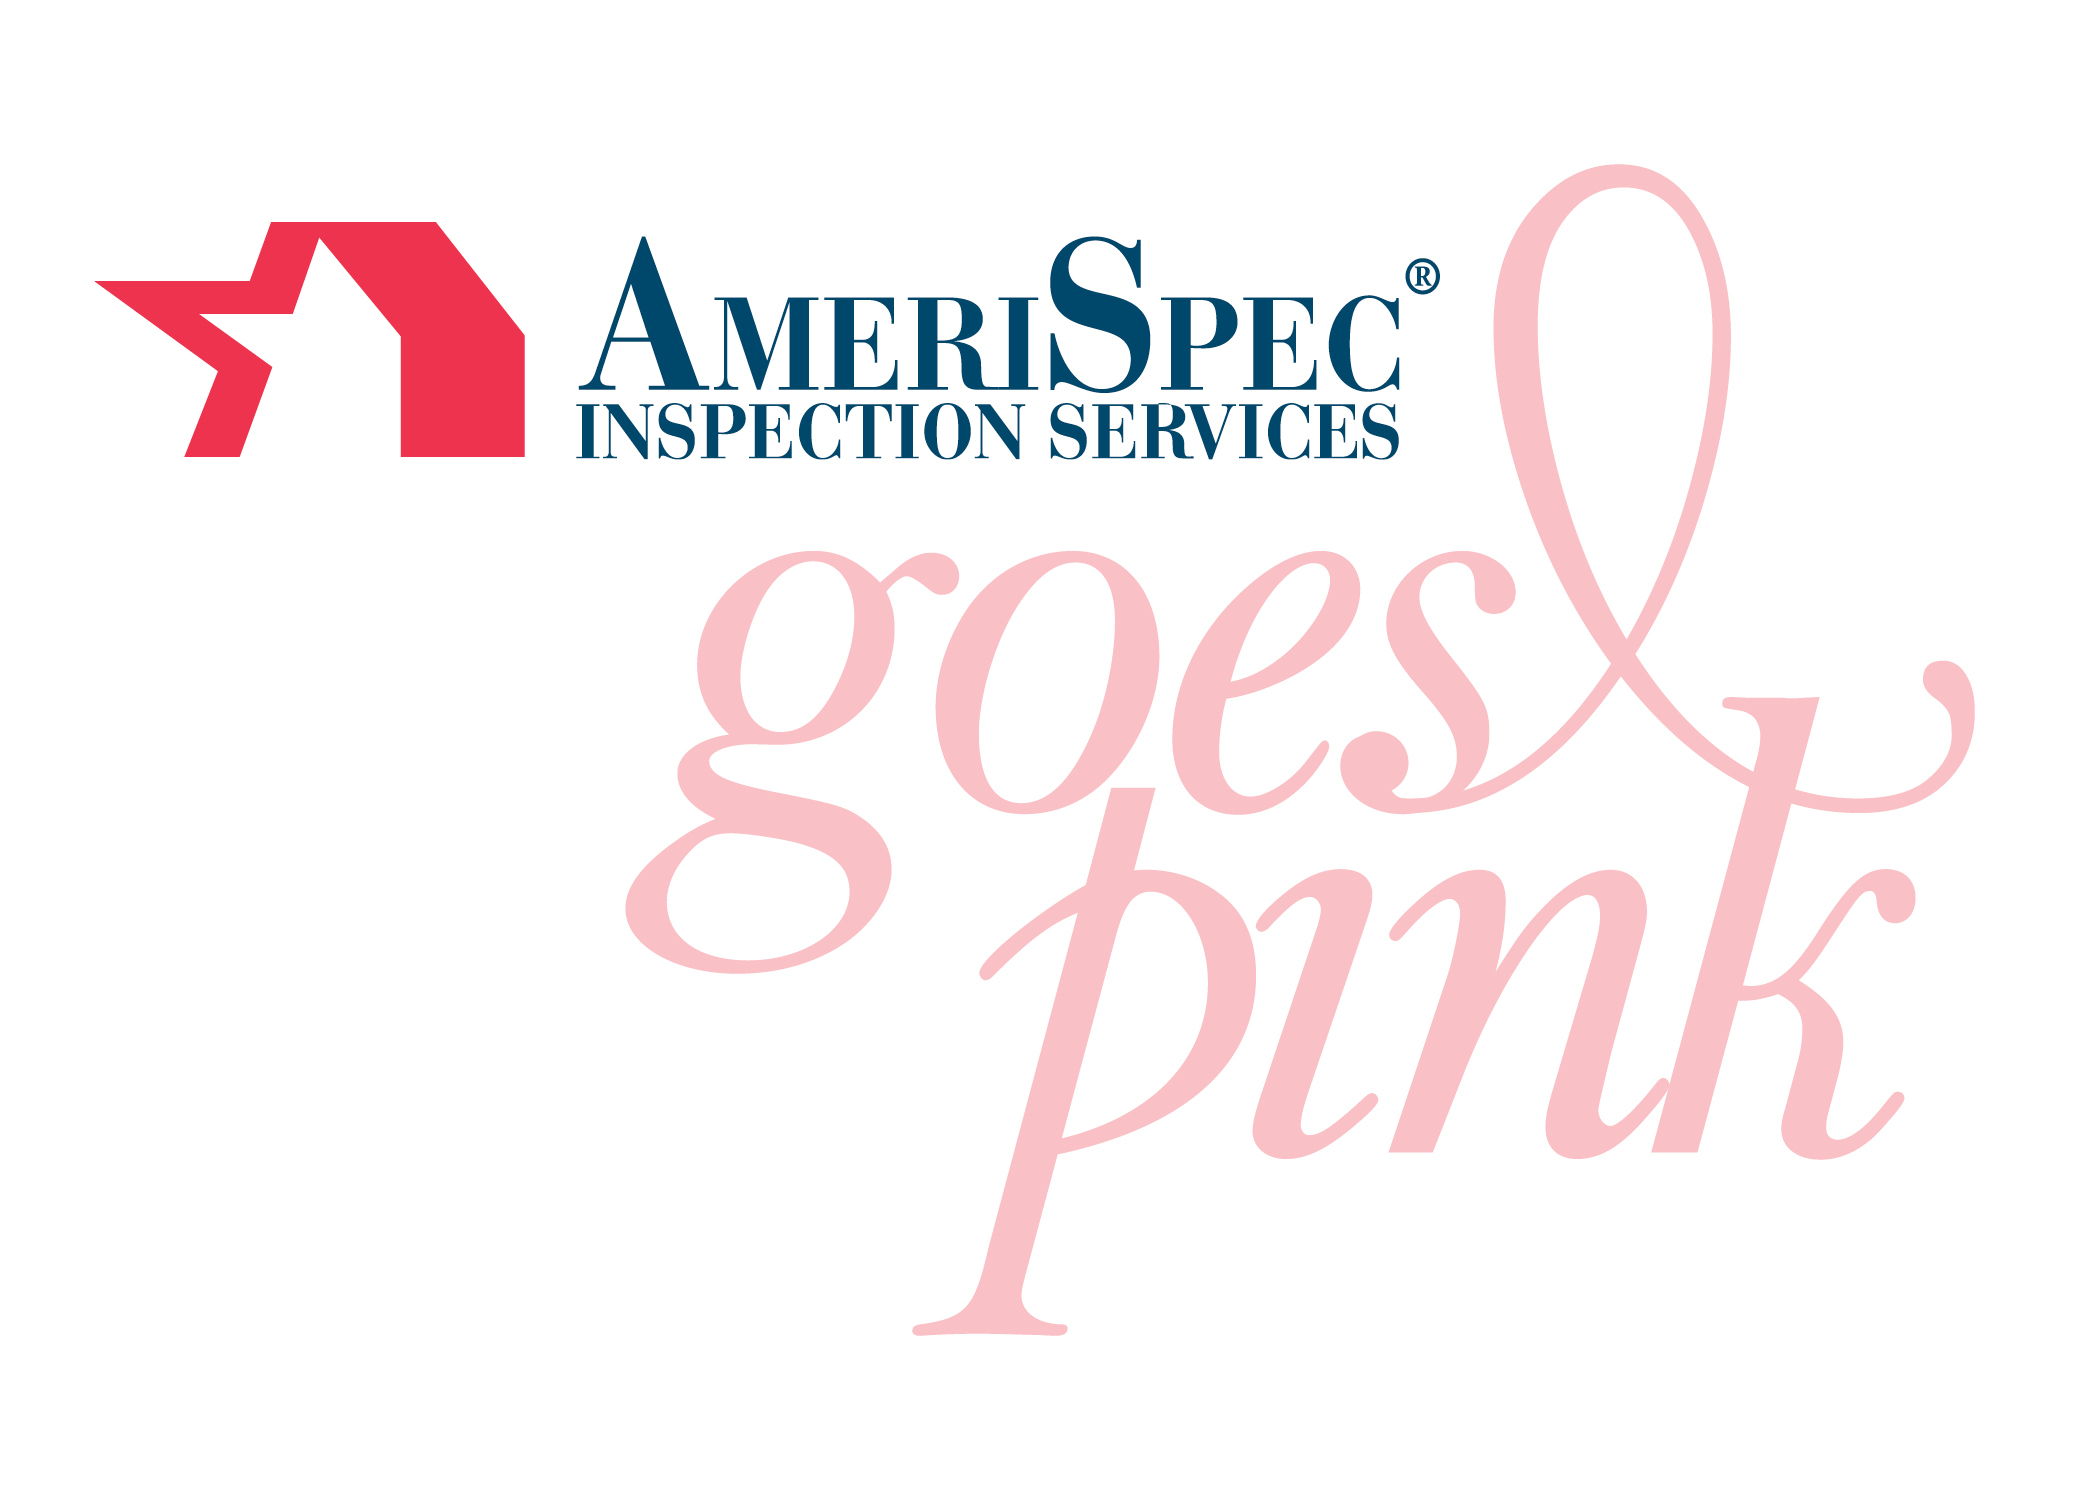 AmeriSpec Inspection Services image 2